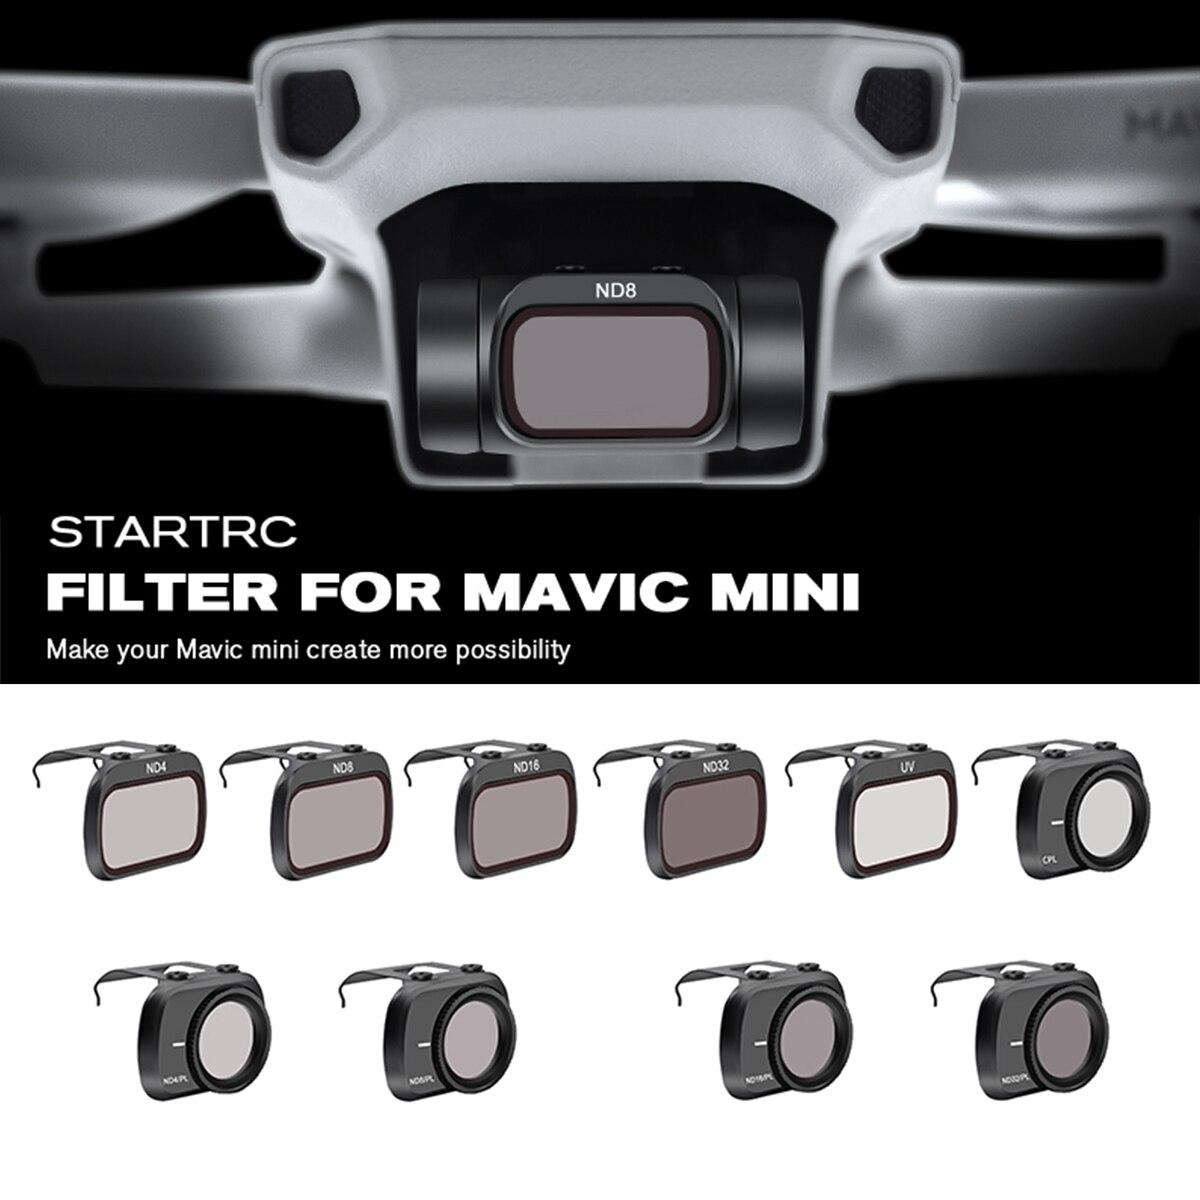 Startrc mavic mini lente nd4/nd8/nd16/nd32/mcuv/cpl conjunto filtro para mavic mini drone lente nd8 nd16 nd32 nd64 pl acessórios kit